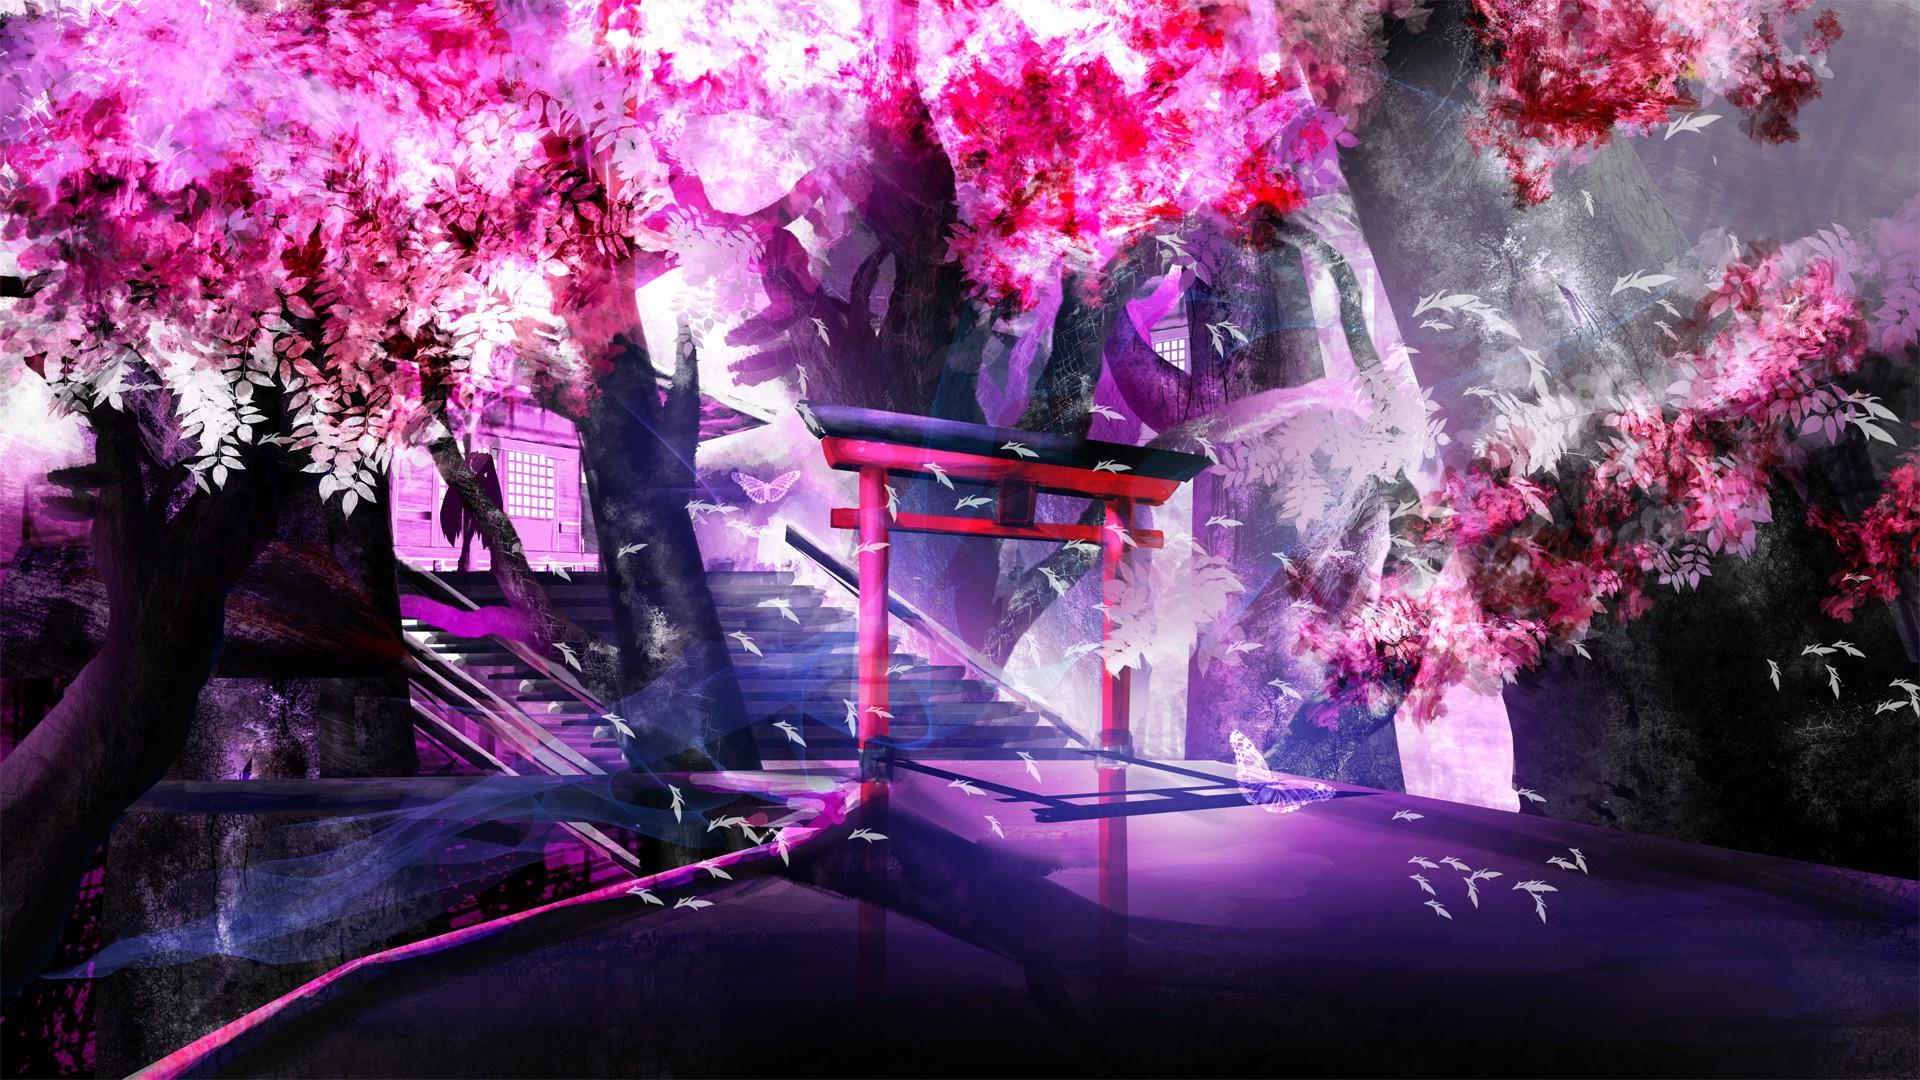 Wallpaper Landscape Anime Purple Violet Branch World Blossom